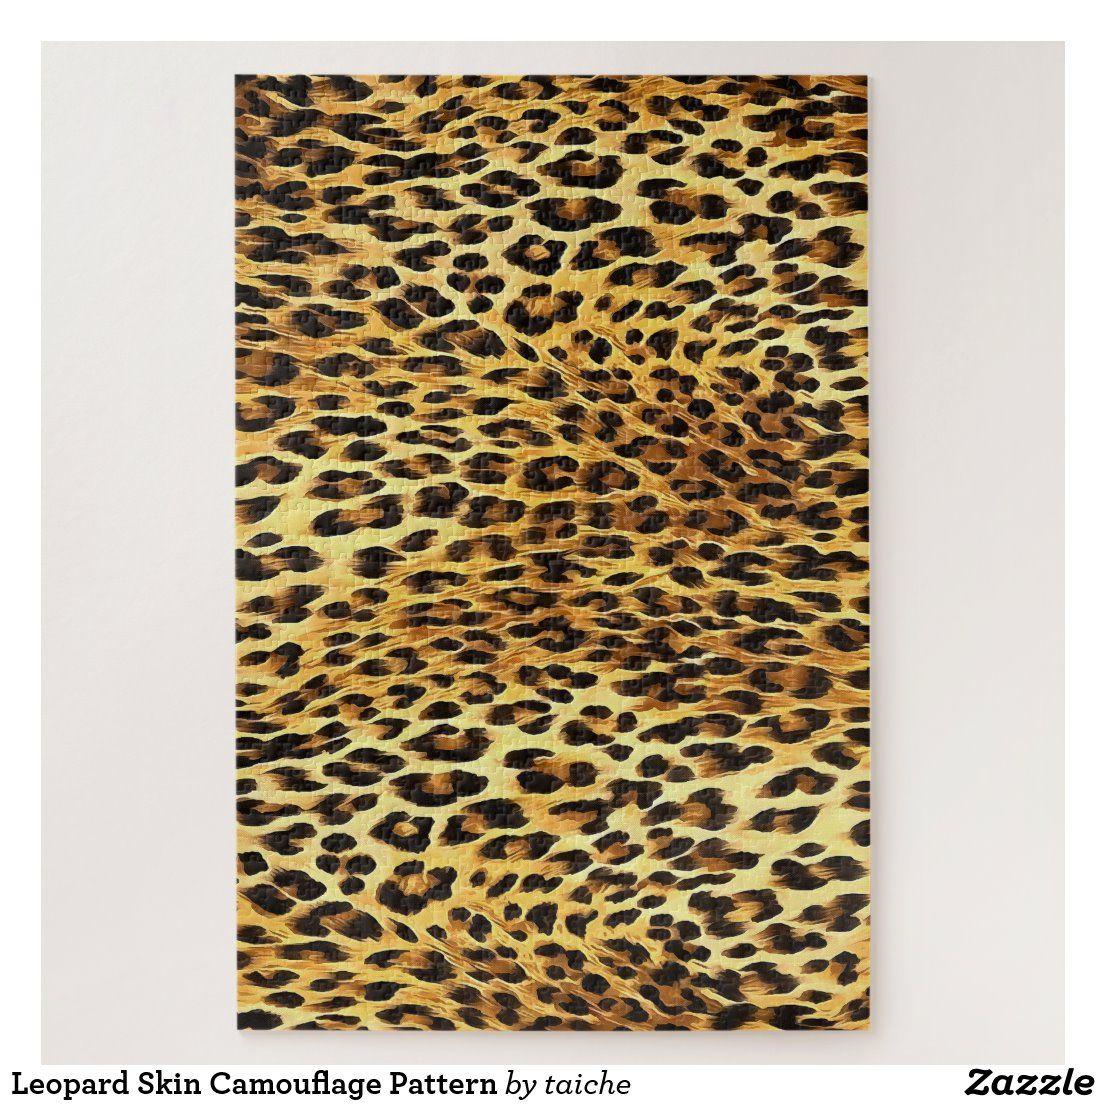 Leopard Skin Camouflage Pattern Jigsaw Puzzle